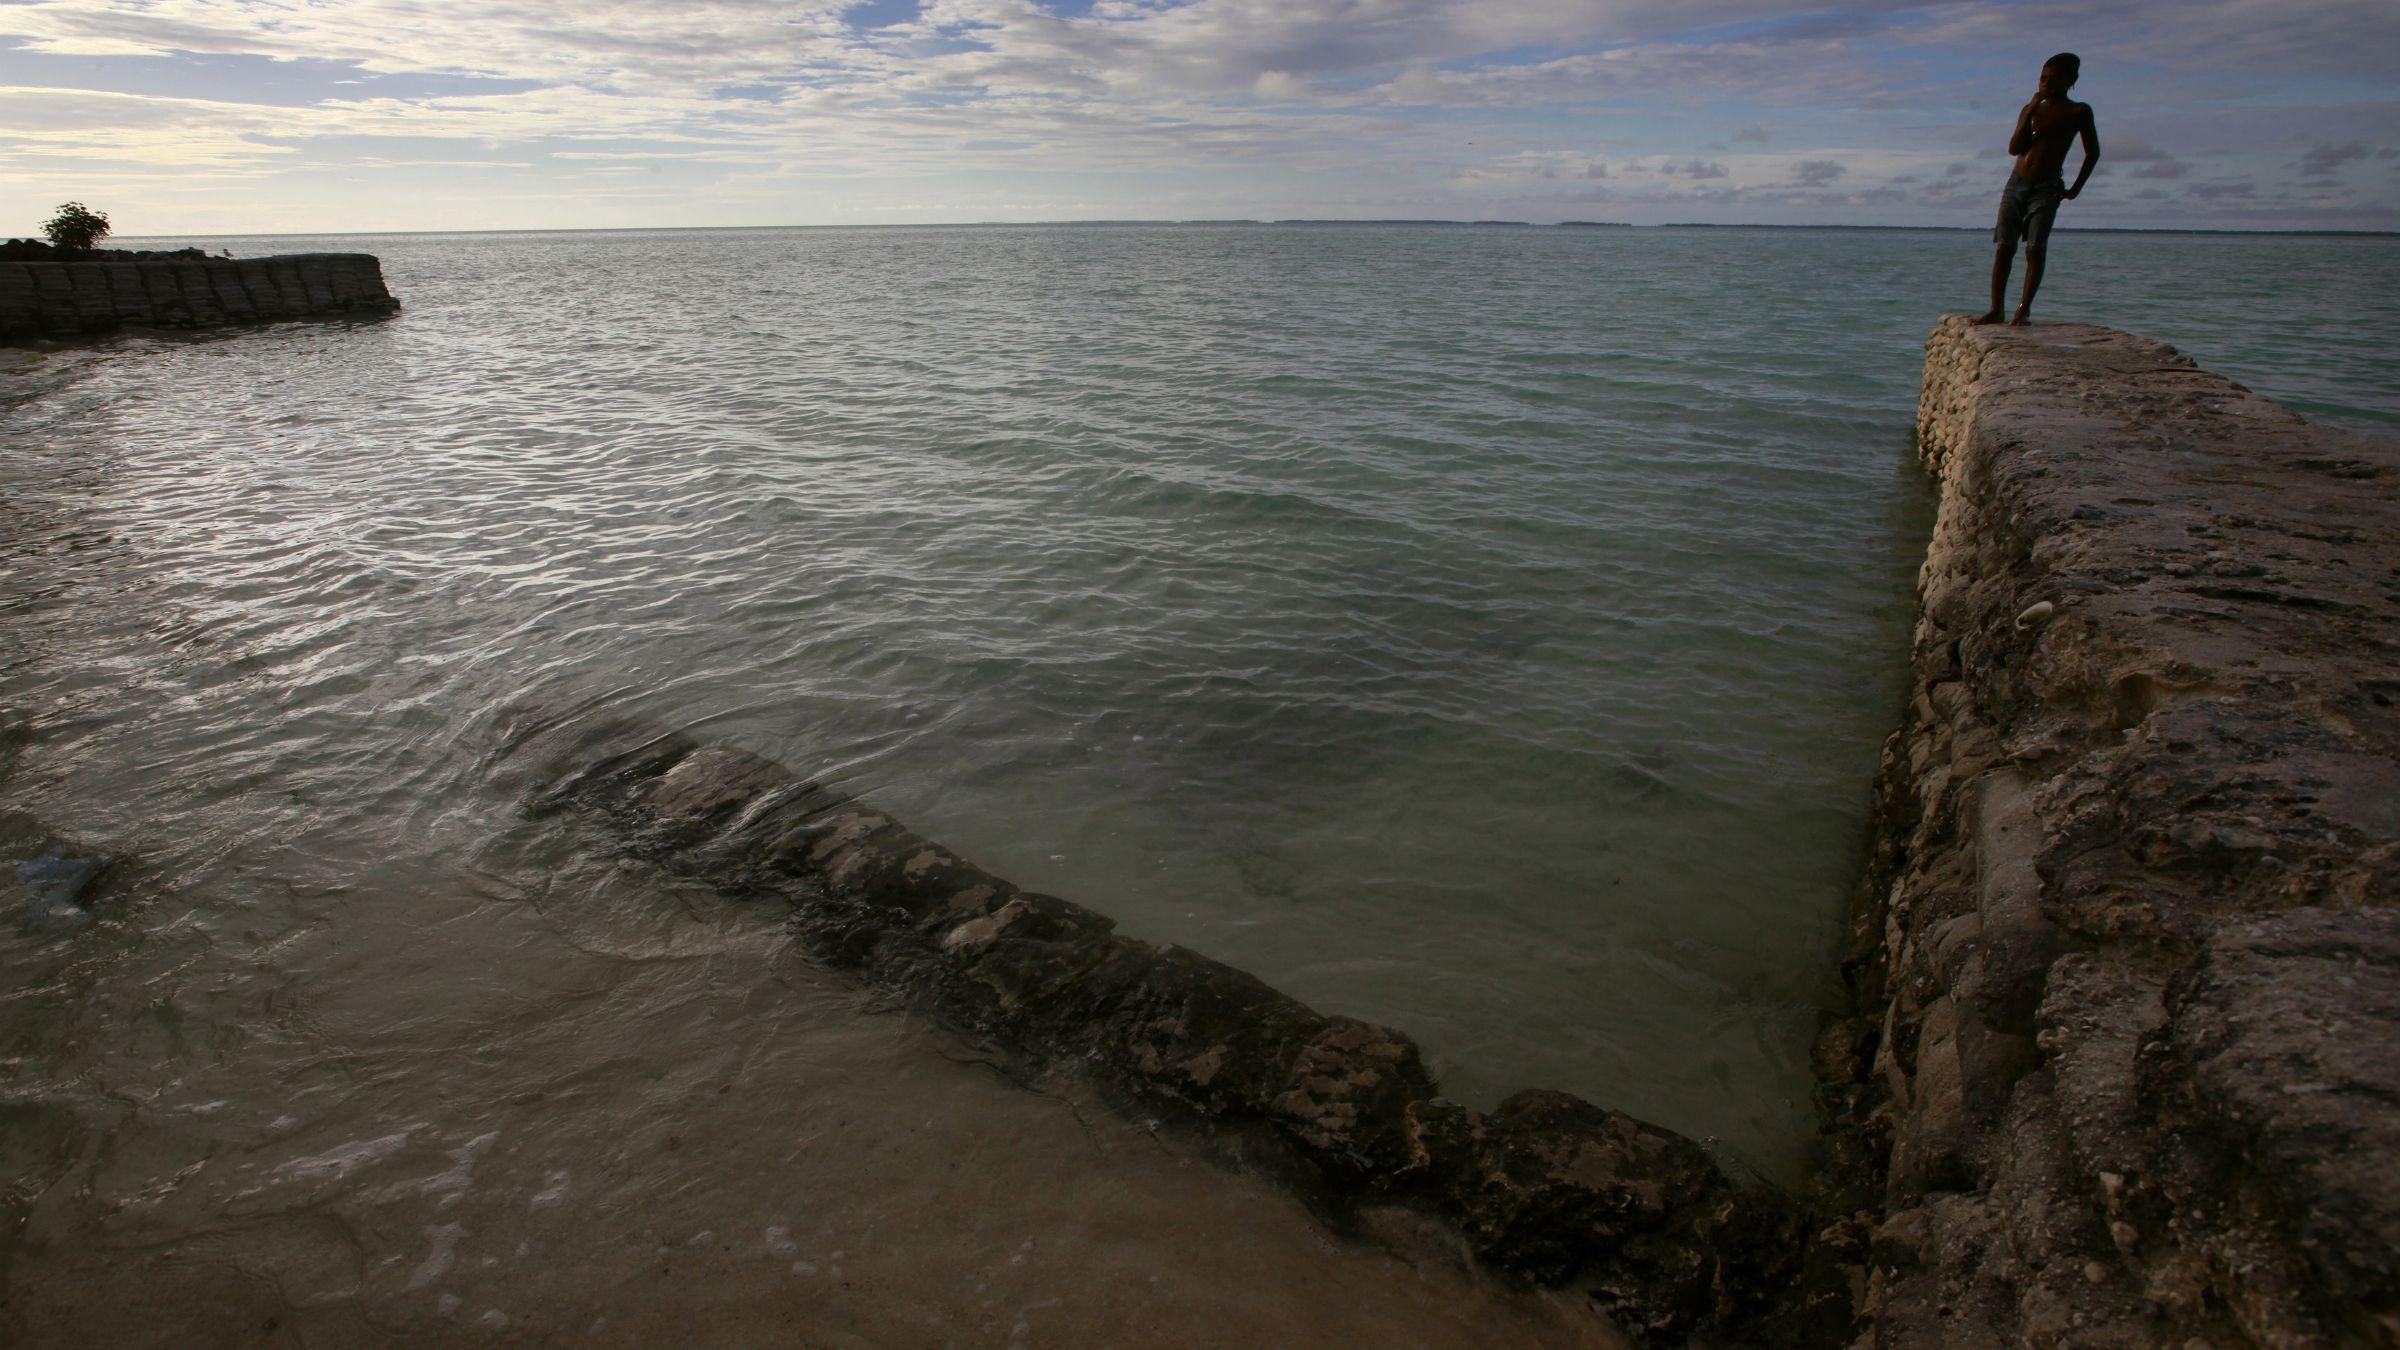 kiribati climate change global warming sea level rise atoll A boy stands on top of a sea-wall near the village of Tangintebu on South Tarawa in the central Pacific island nation of Kiribati May 26, 2013. REUTERS/David Gray